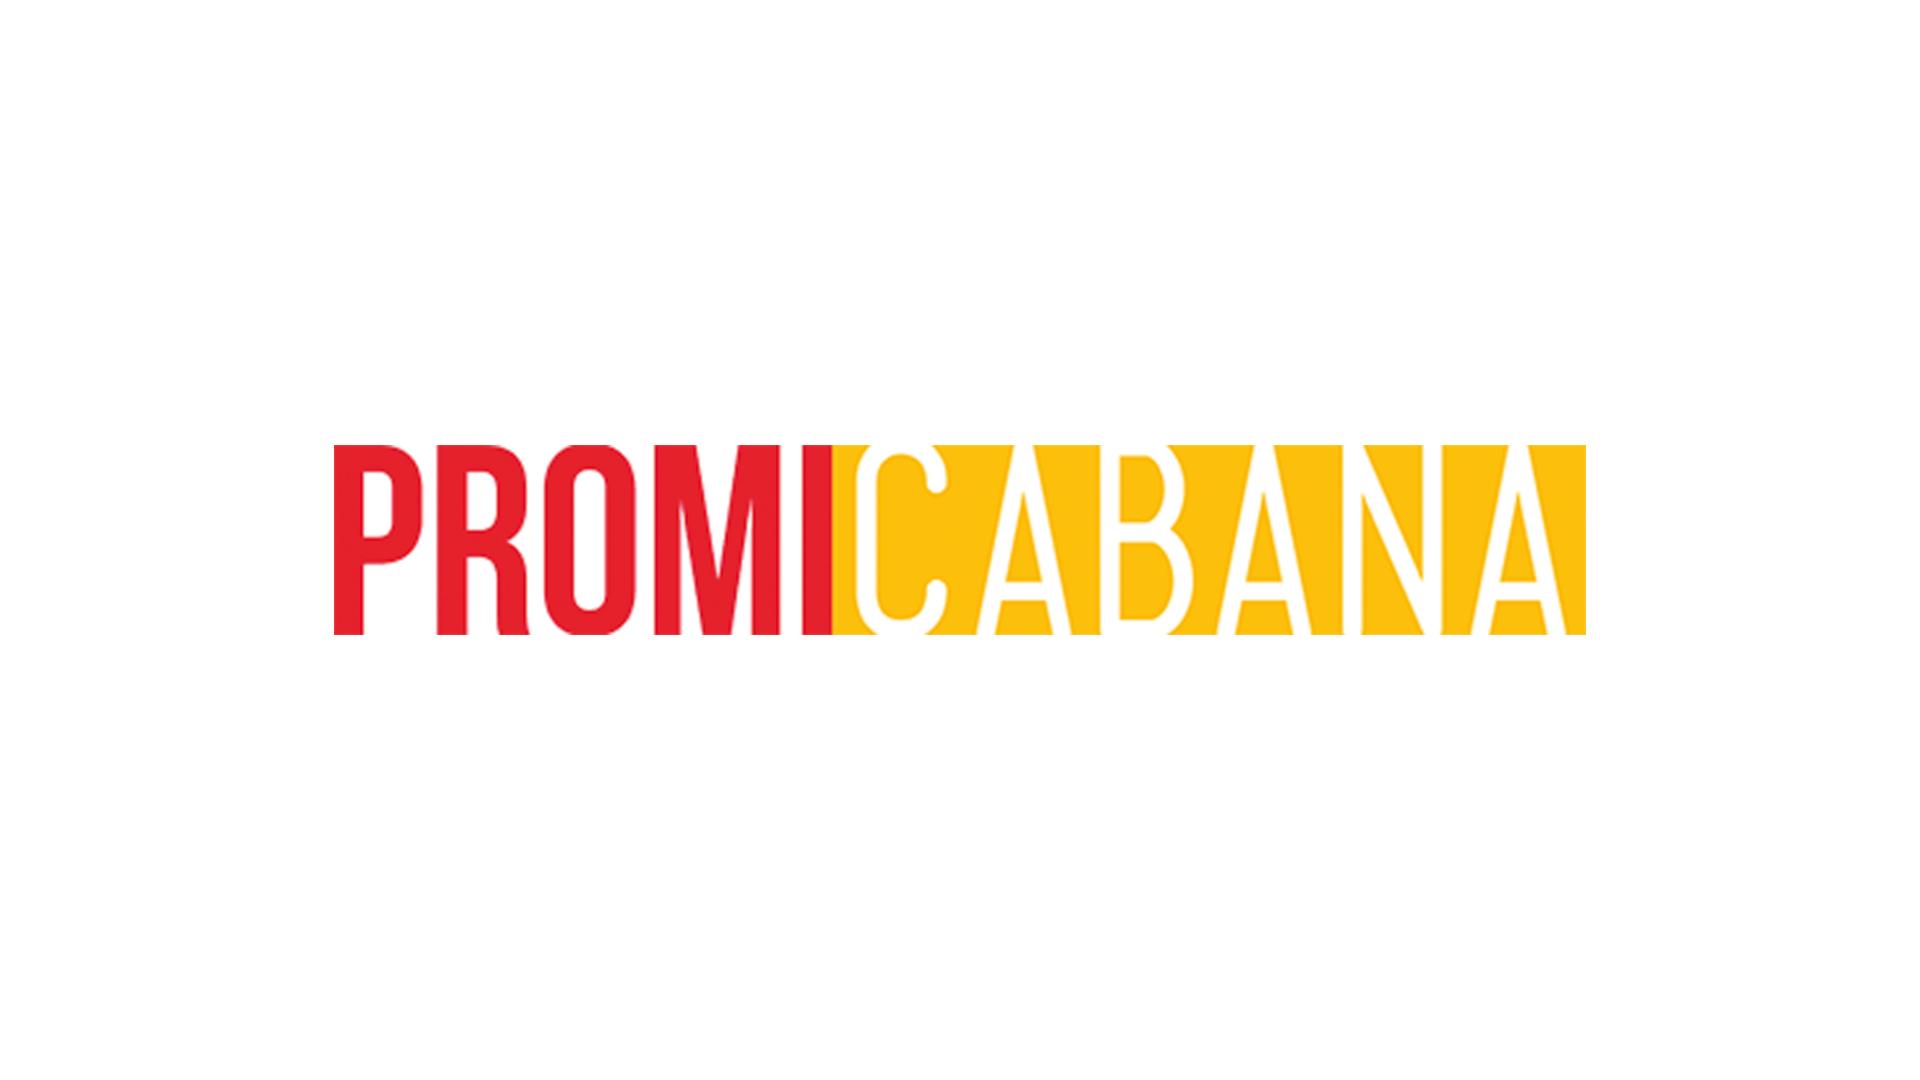 Robert-Pattinson-Lizzy-Victoria-Berlinale-Premiere